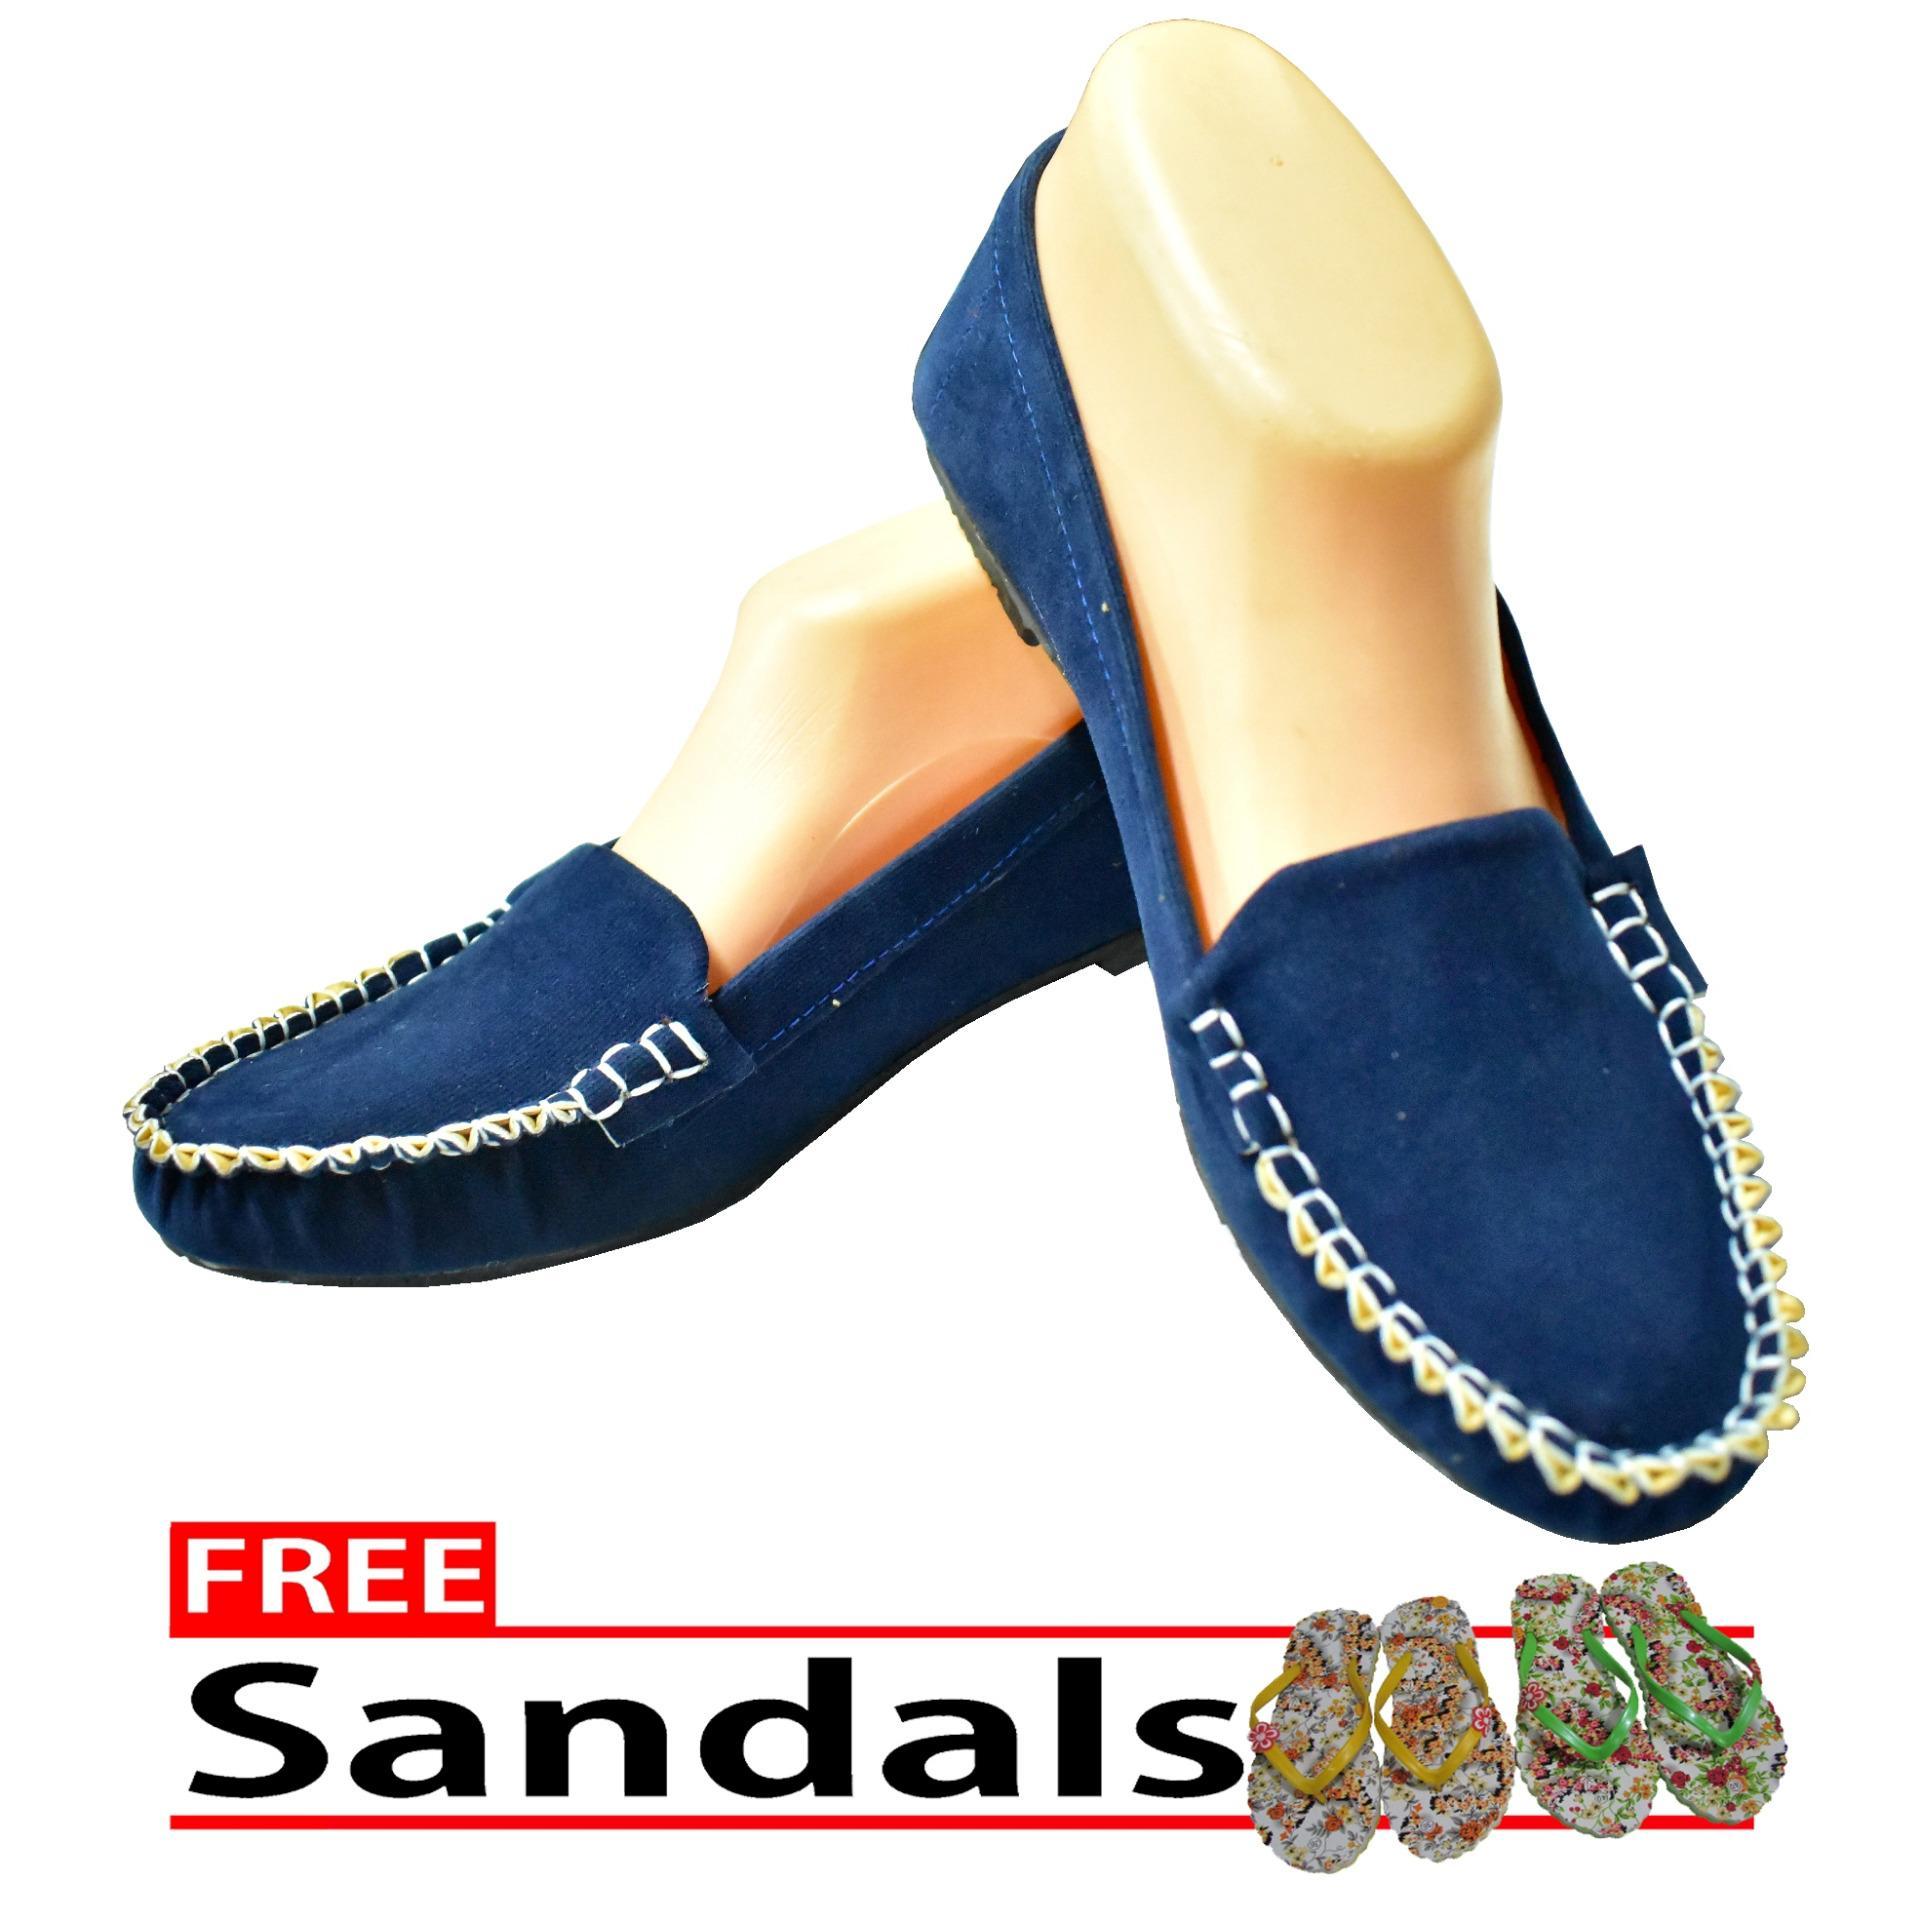 Aintan Flat Shoes NS 02- Sepatu Balet - Biru Free Sandals .